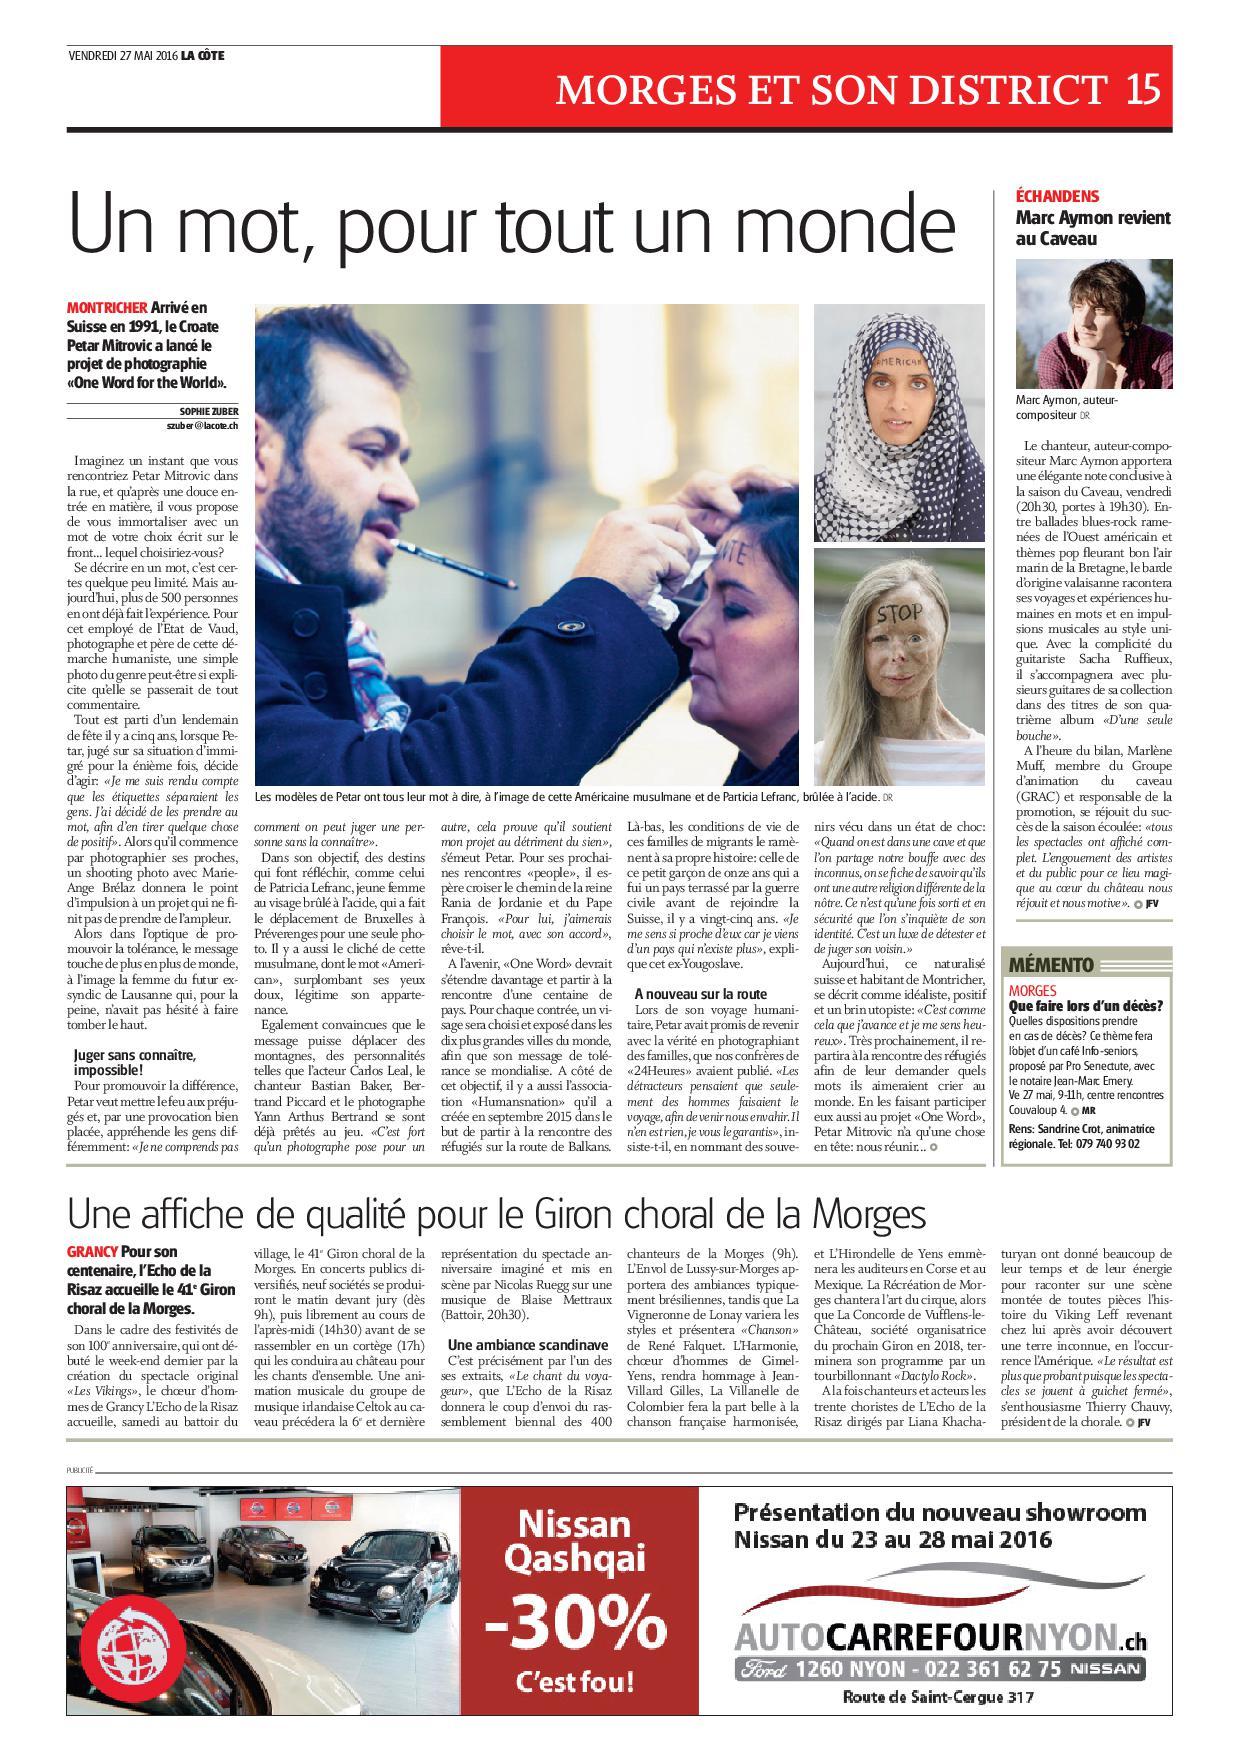 Journal La Côte - Vendredi 27 mai 2016